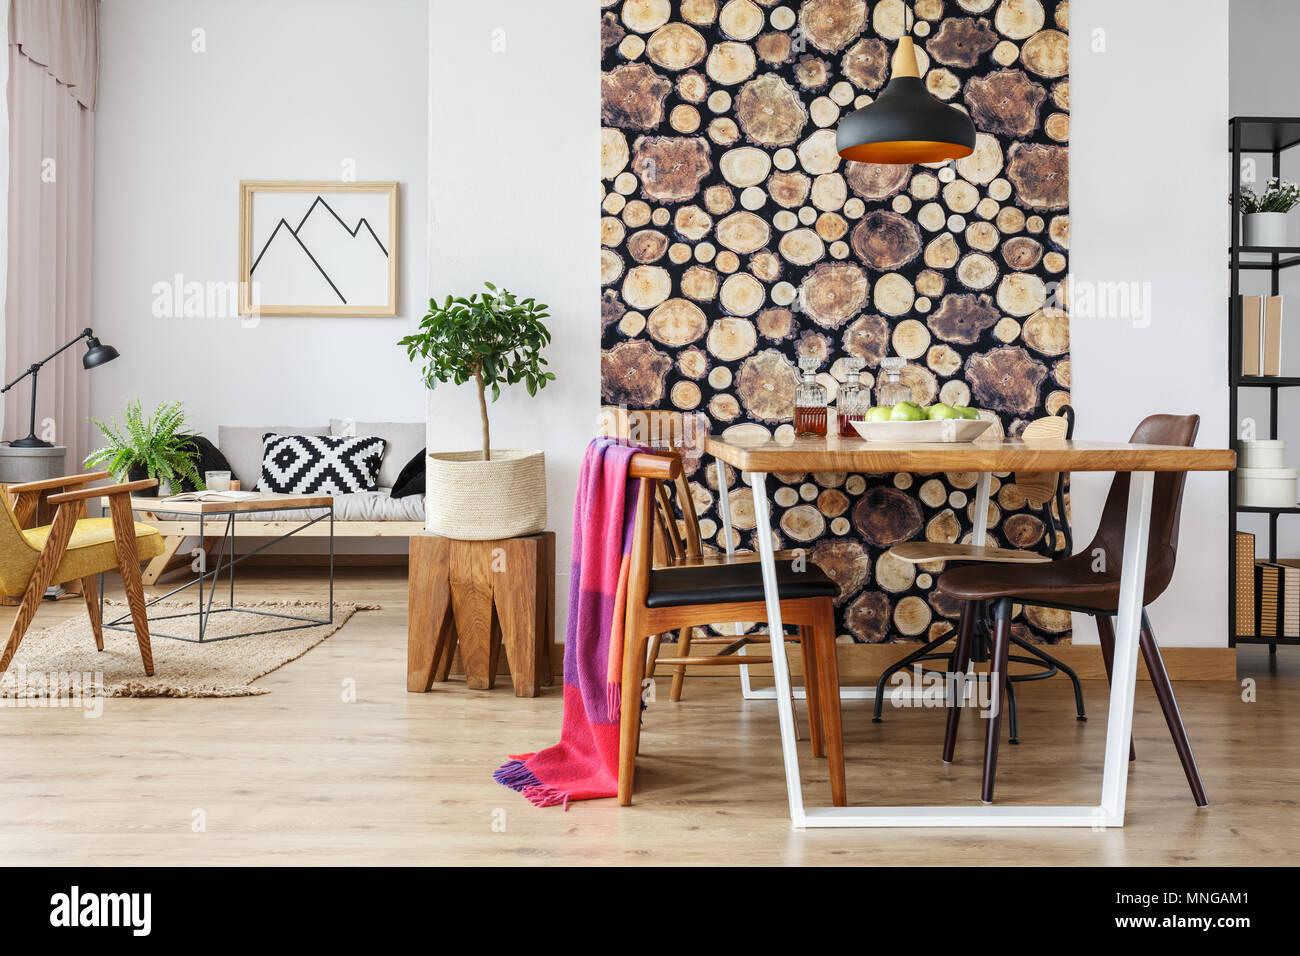 Scandinavian open floor plan apartment with winter interior design and natural wooden decor - Stock Image